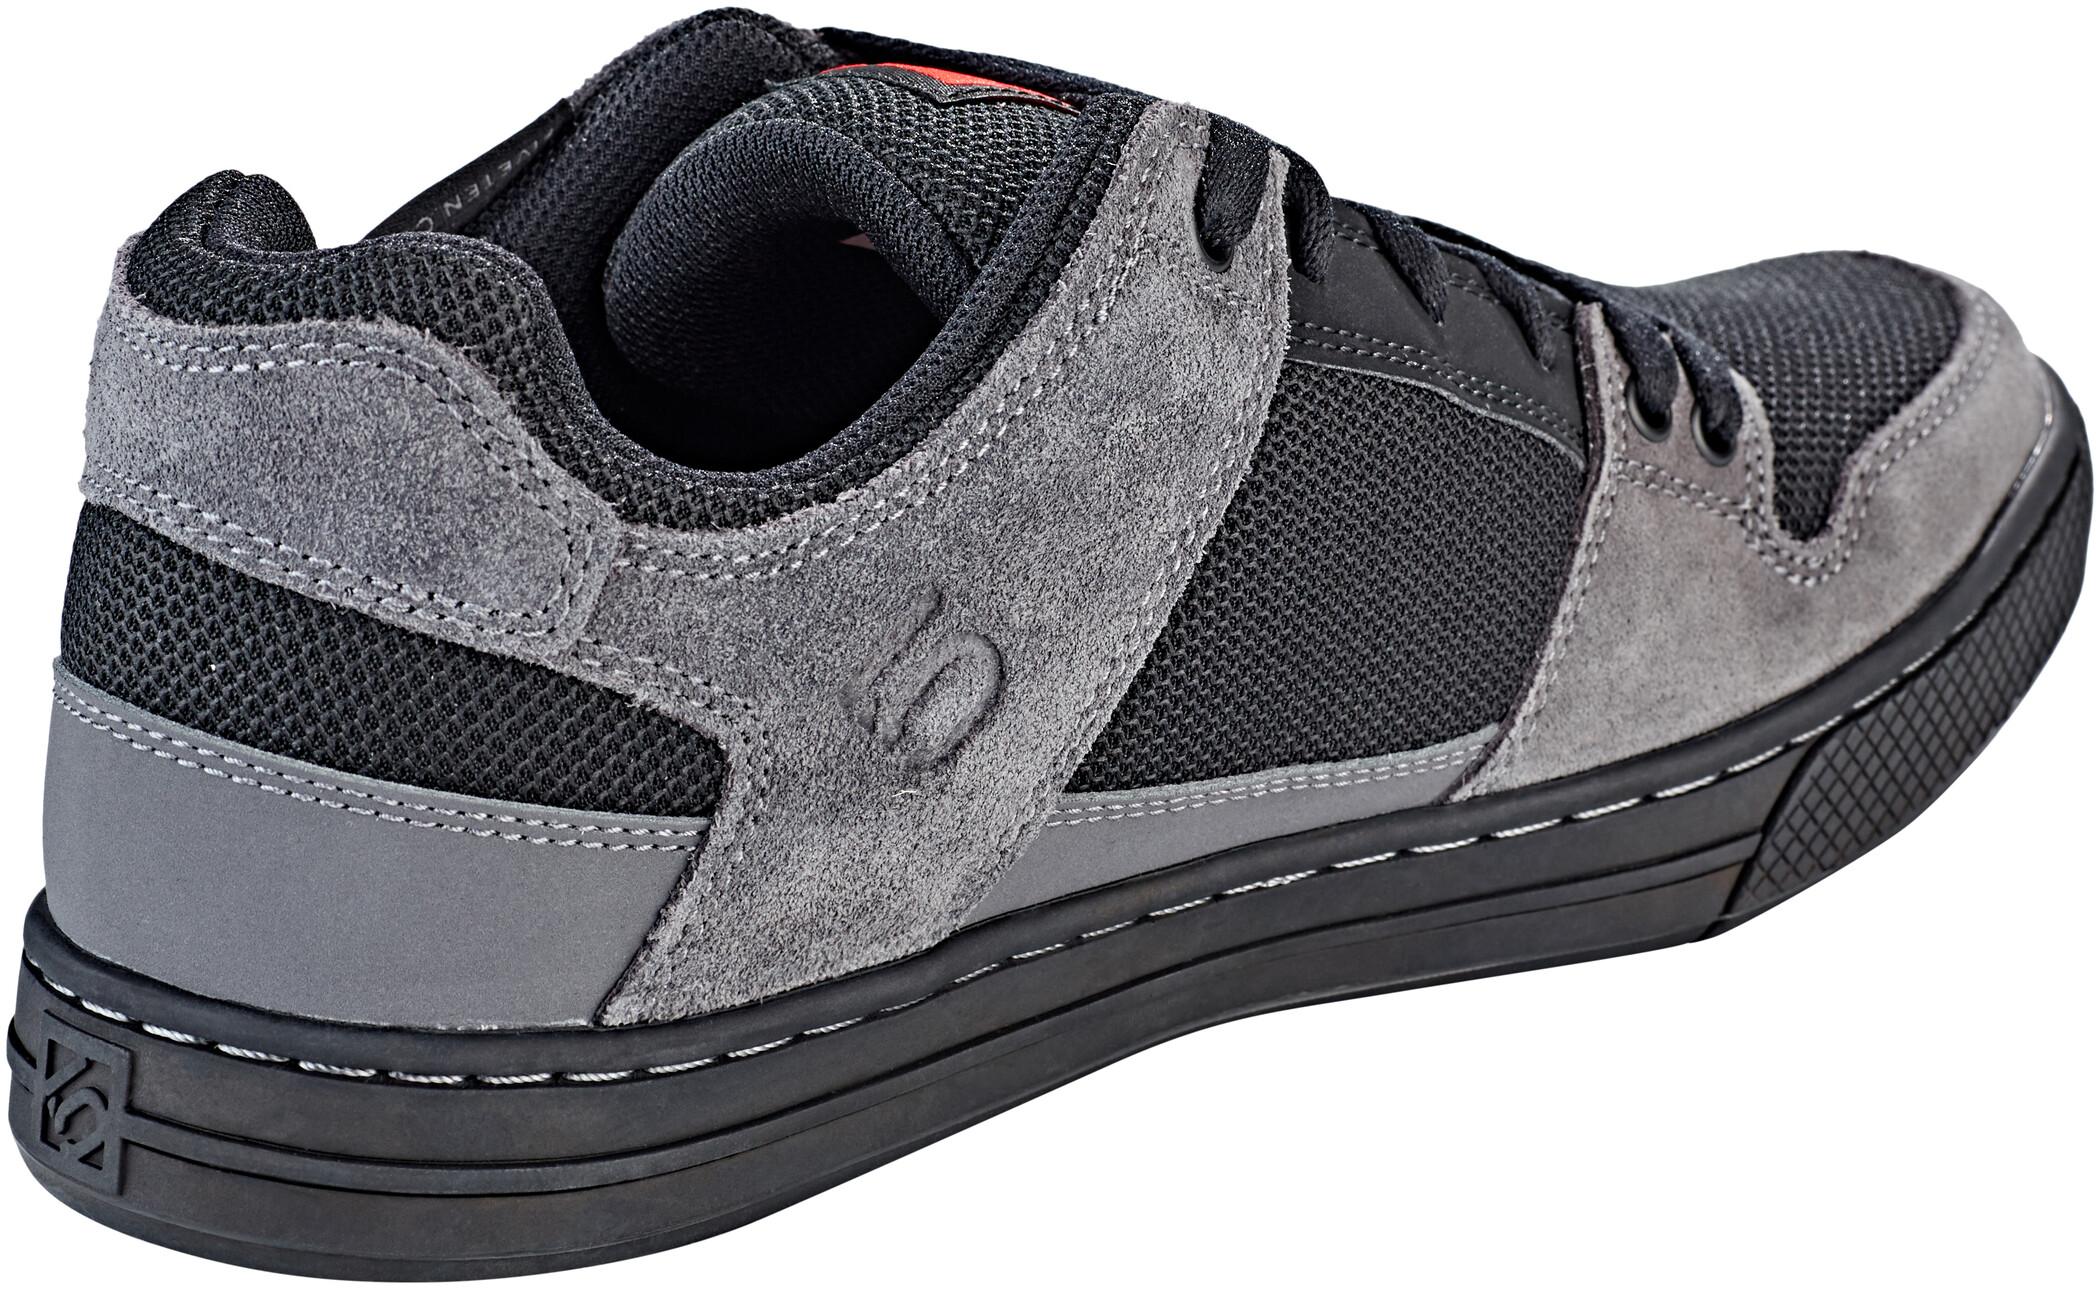 adidas Five Ten Freerider Mountain Bike Schuhe Herren online